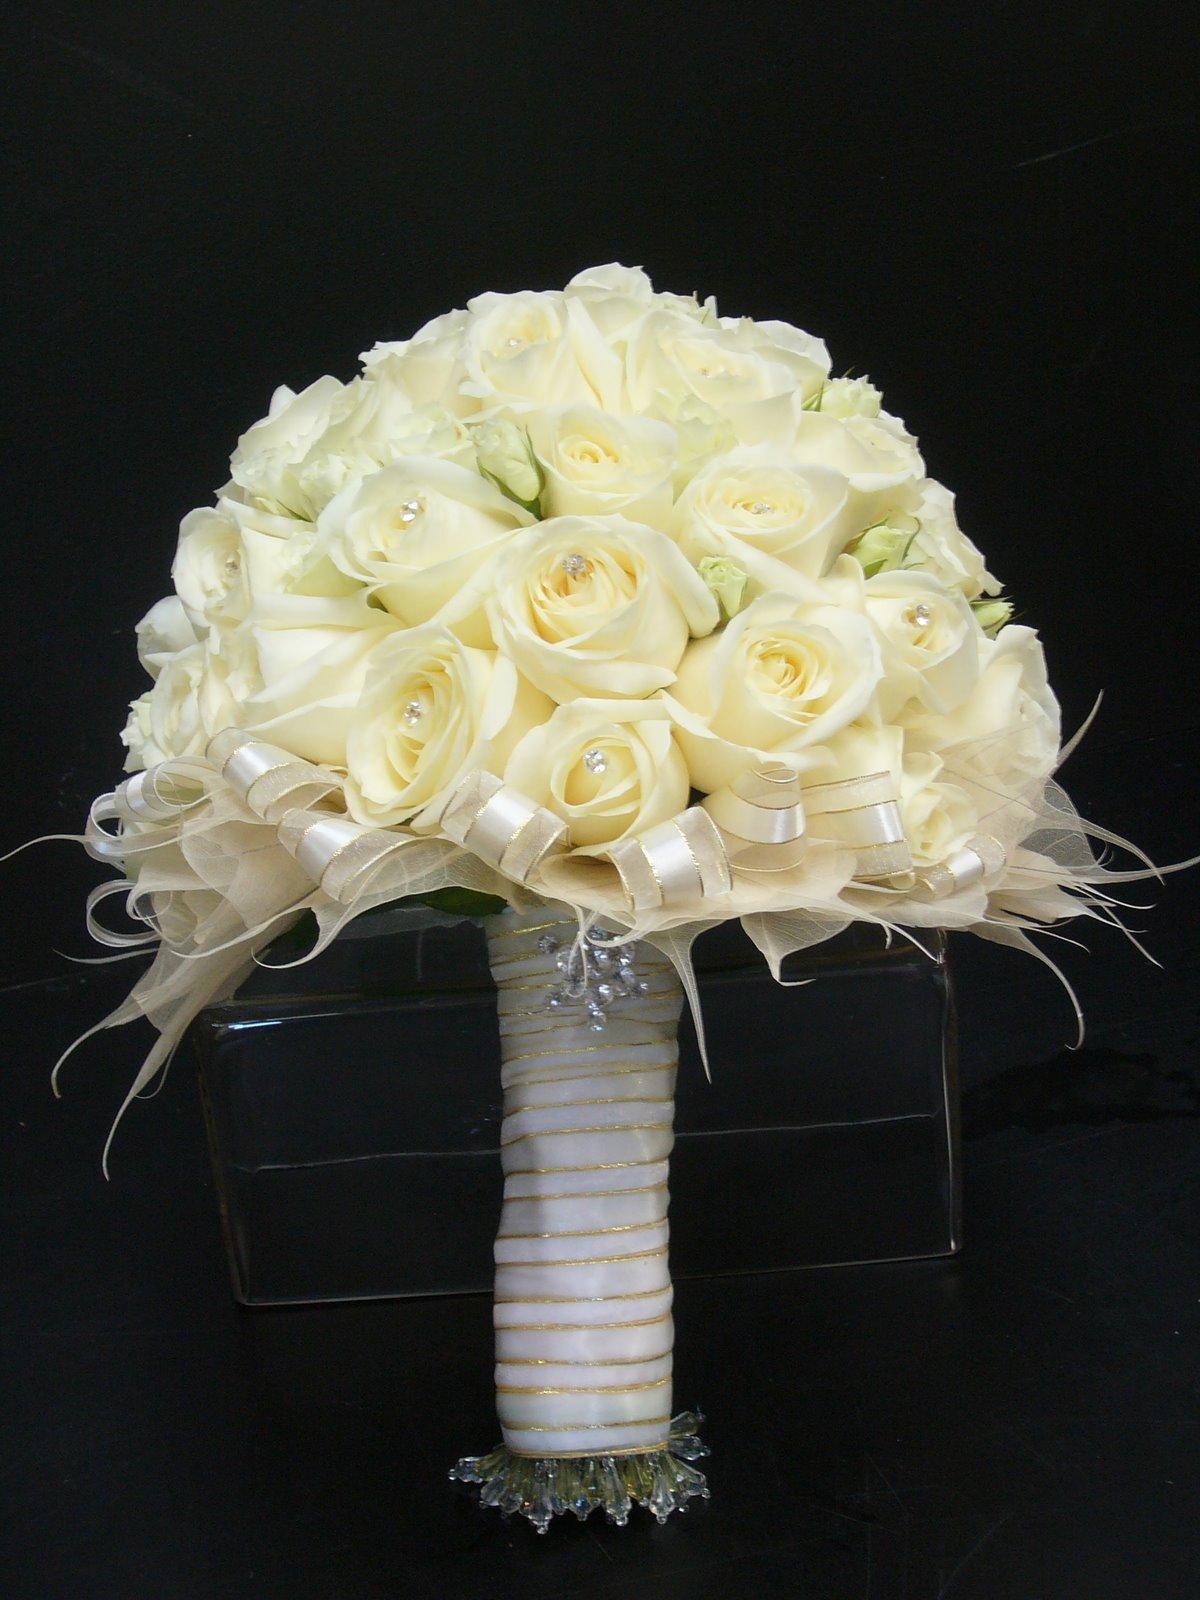 The Beautiful White Wedding Flowers